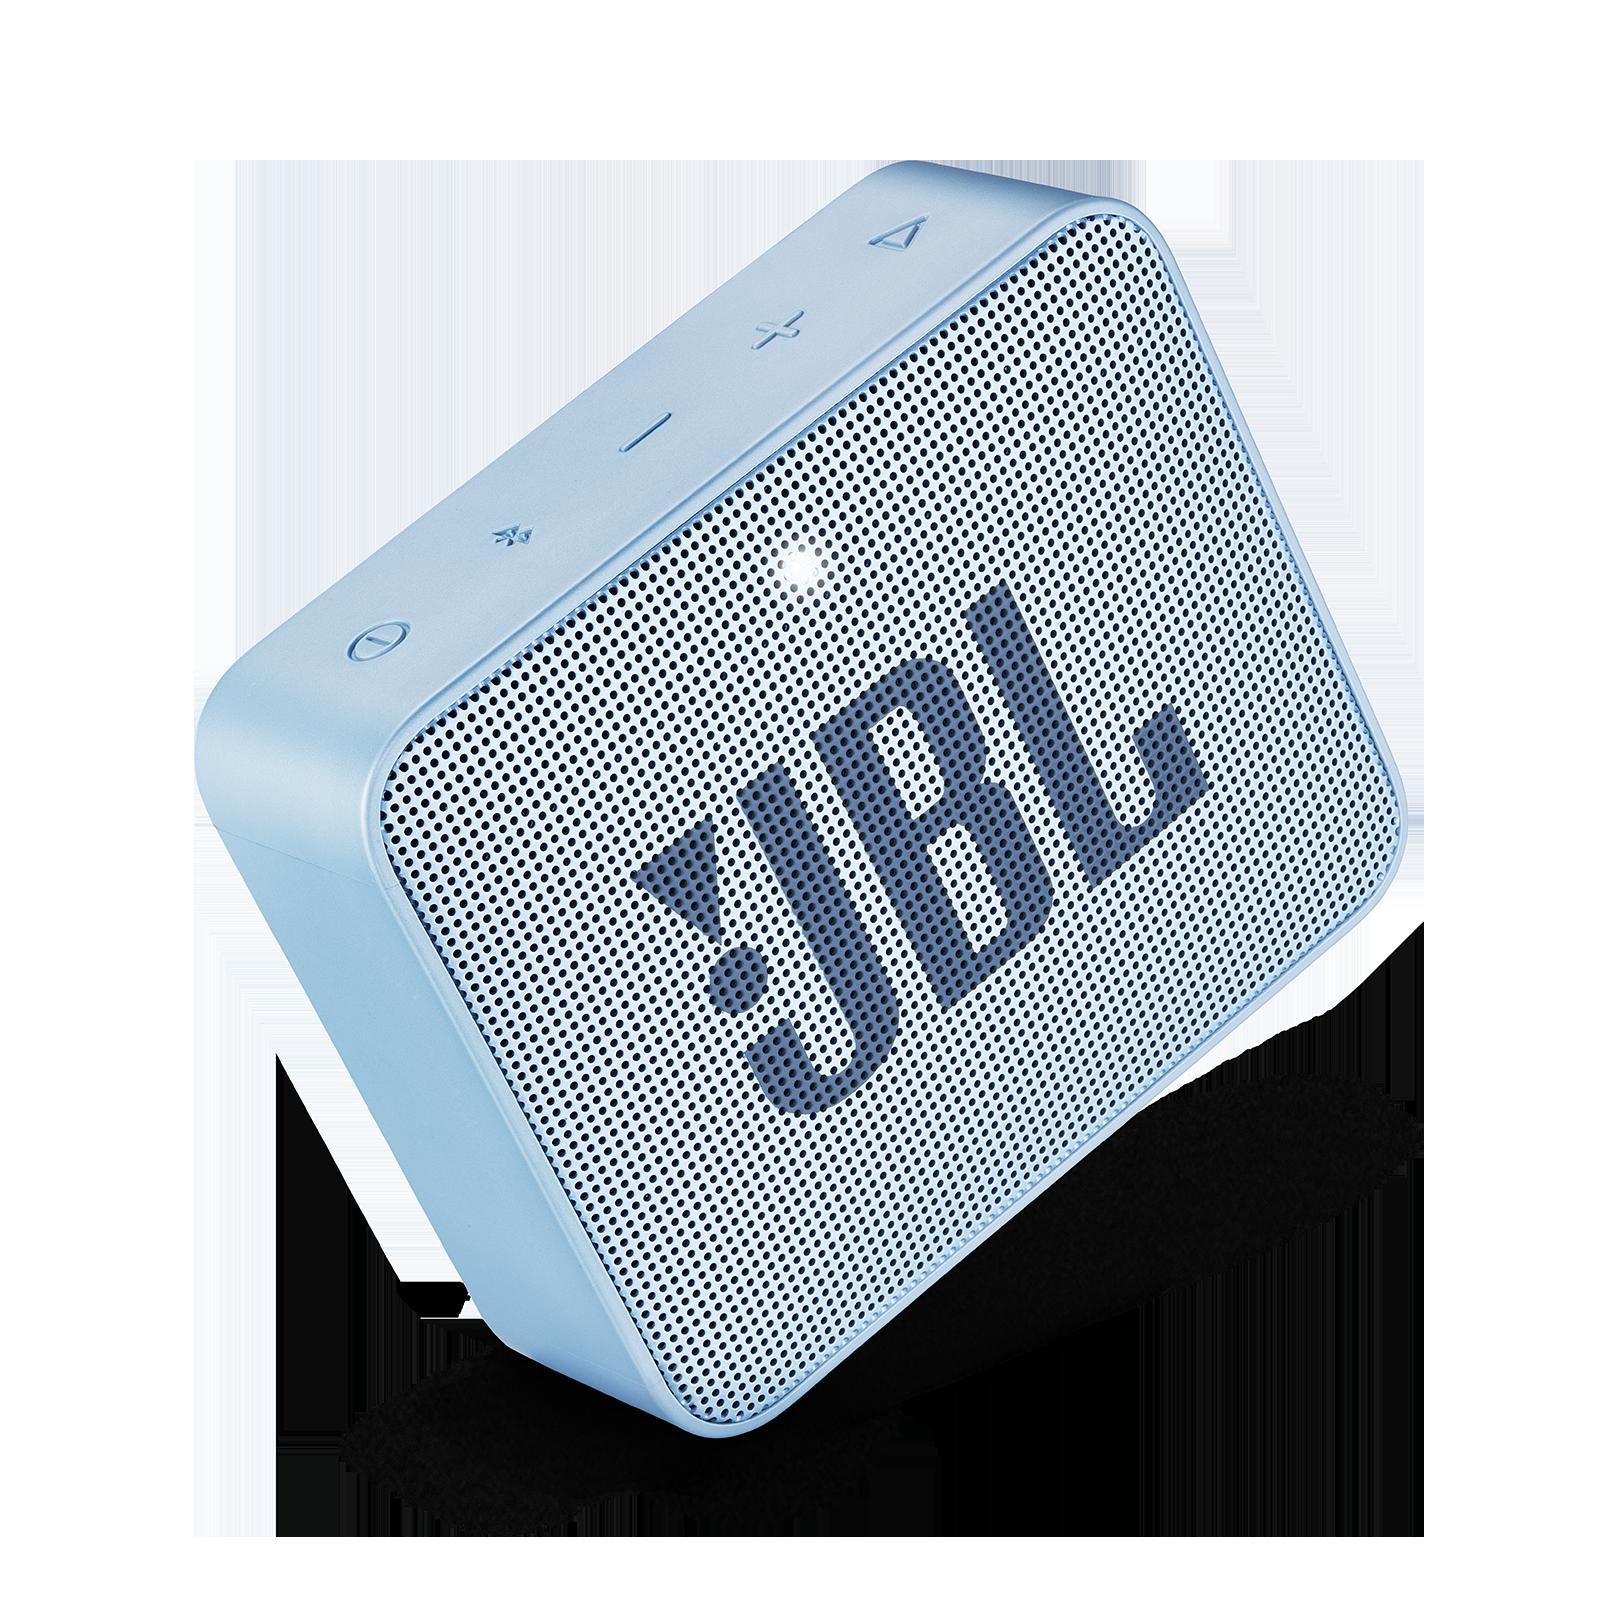 JBL GO 2 - Icecube Cyan - Portable Bluetooth speaker - Detailshot 1